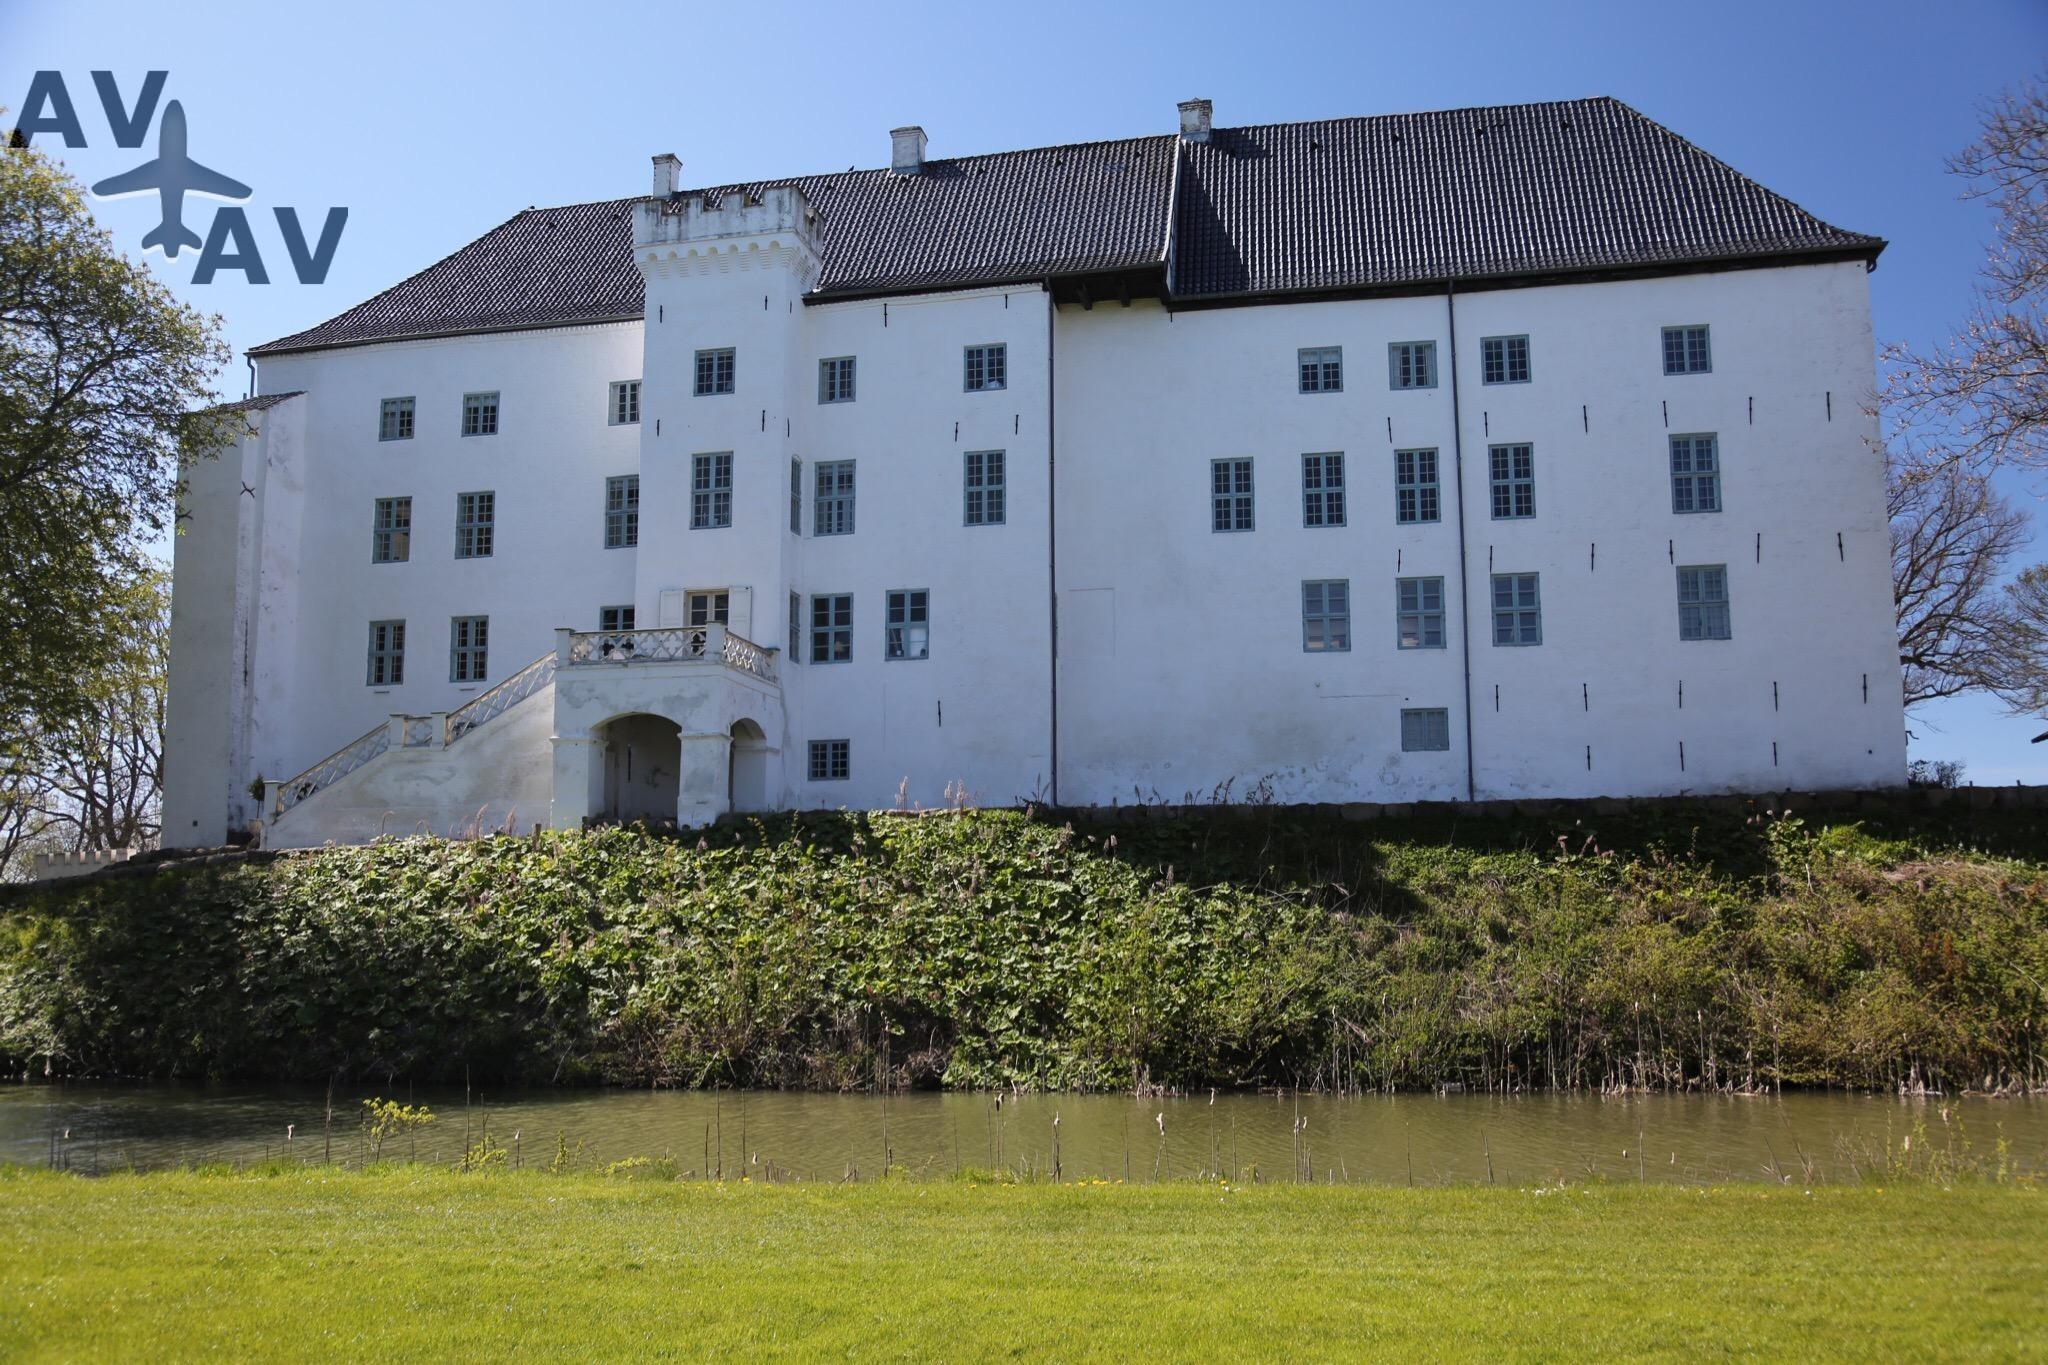 Zamok Dragsholm - Самые загадочные замки мира